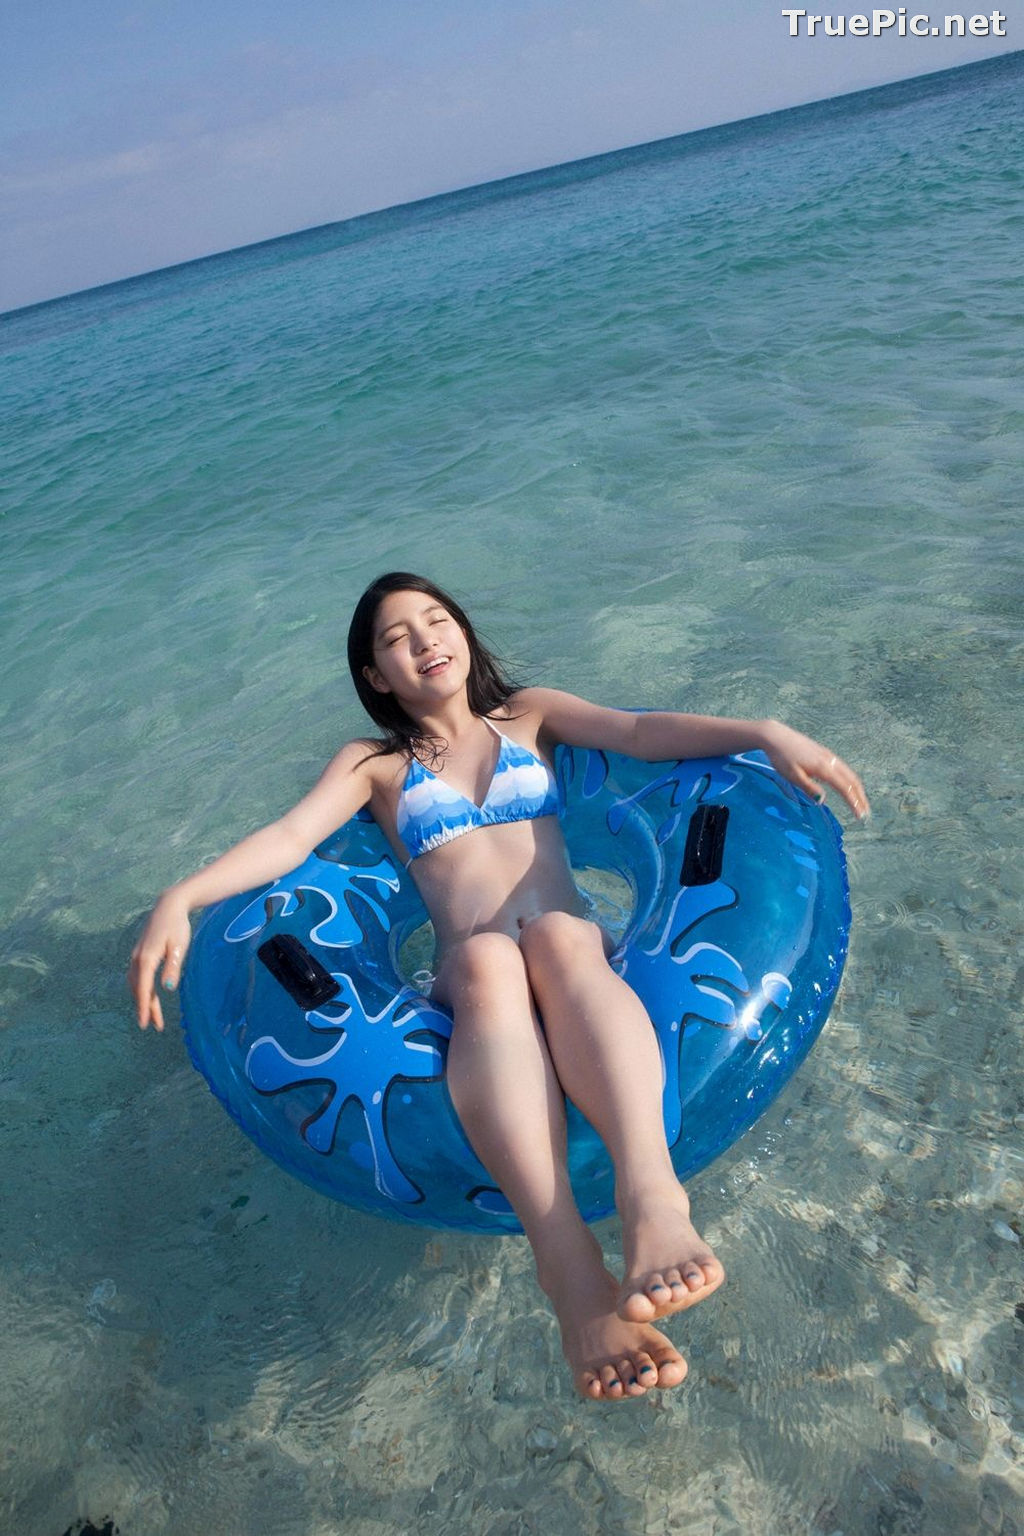 Image [YS Web] Vol.506 - Japanese Actress and Singer - Umika Kawashima - TruePic.net - Picture-24